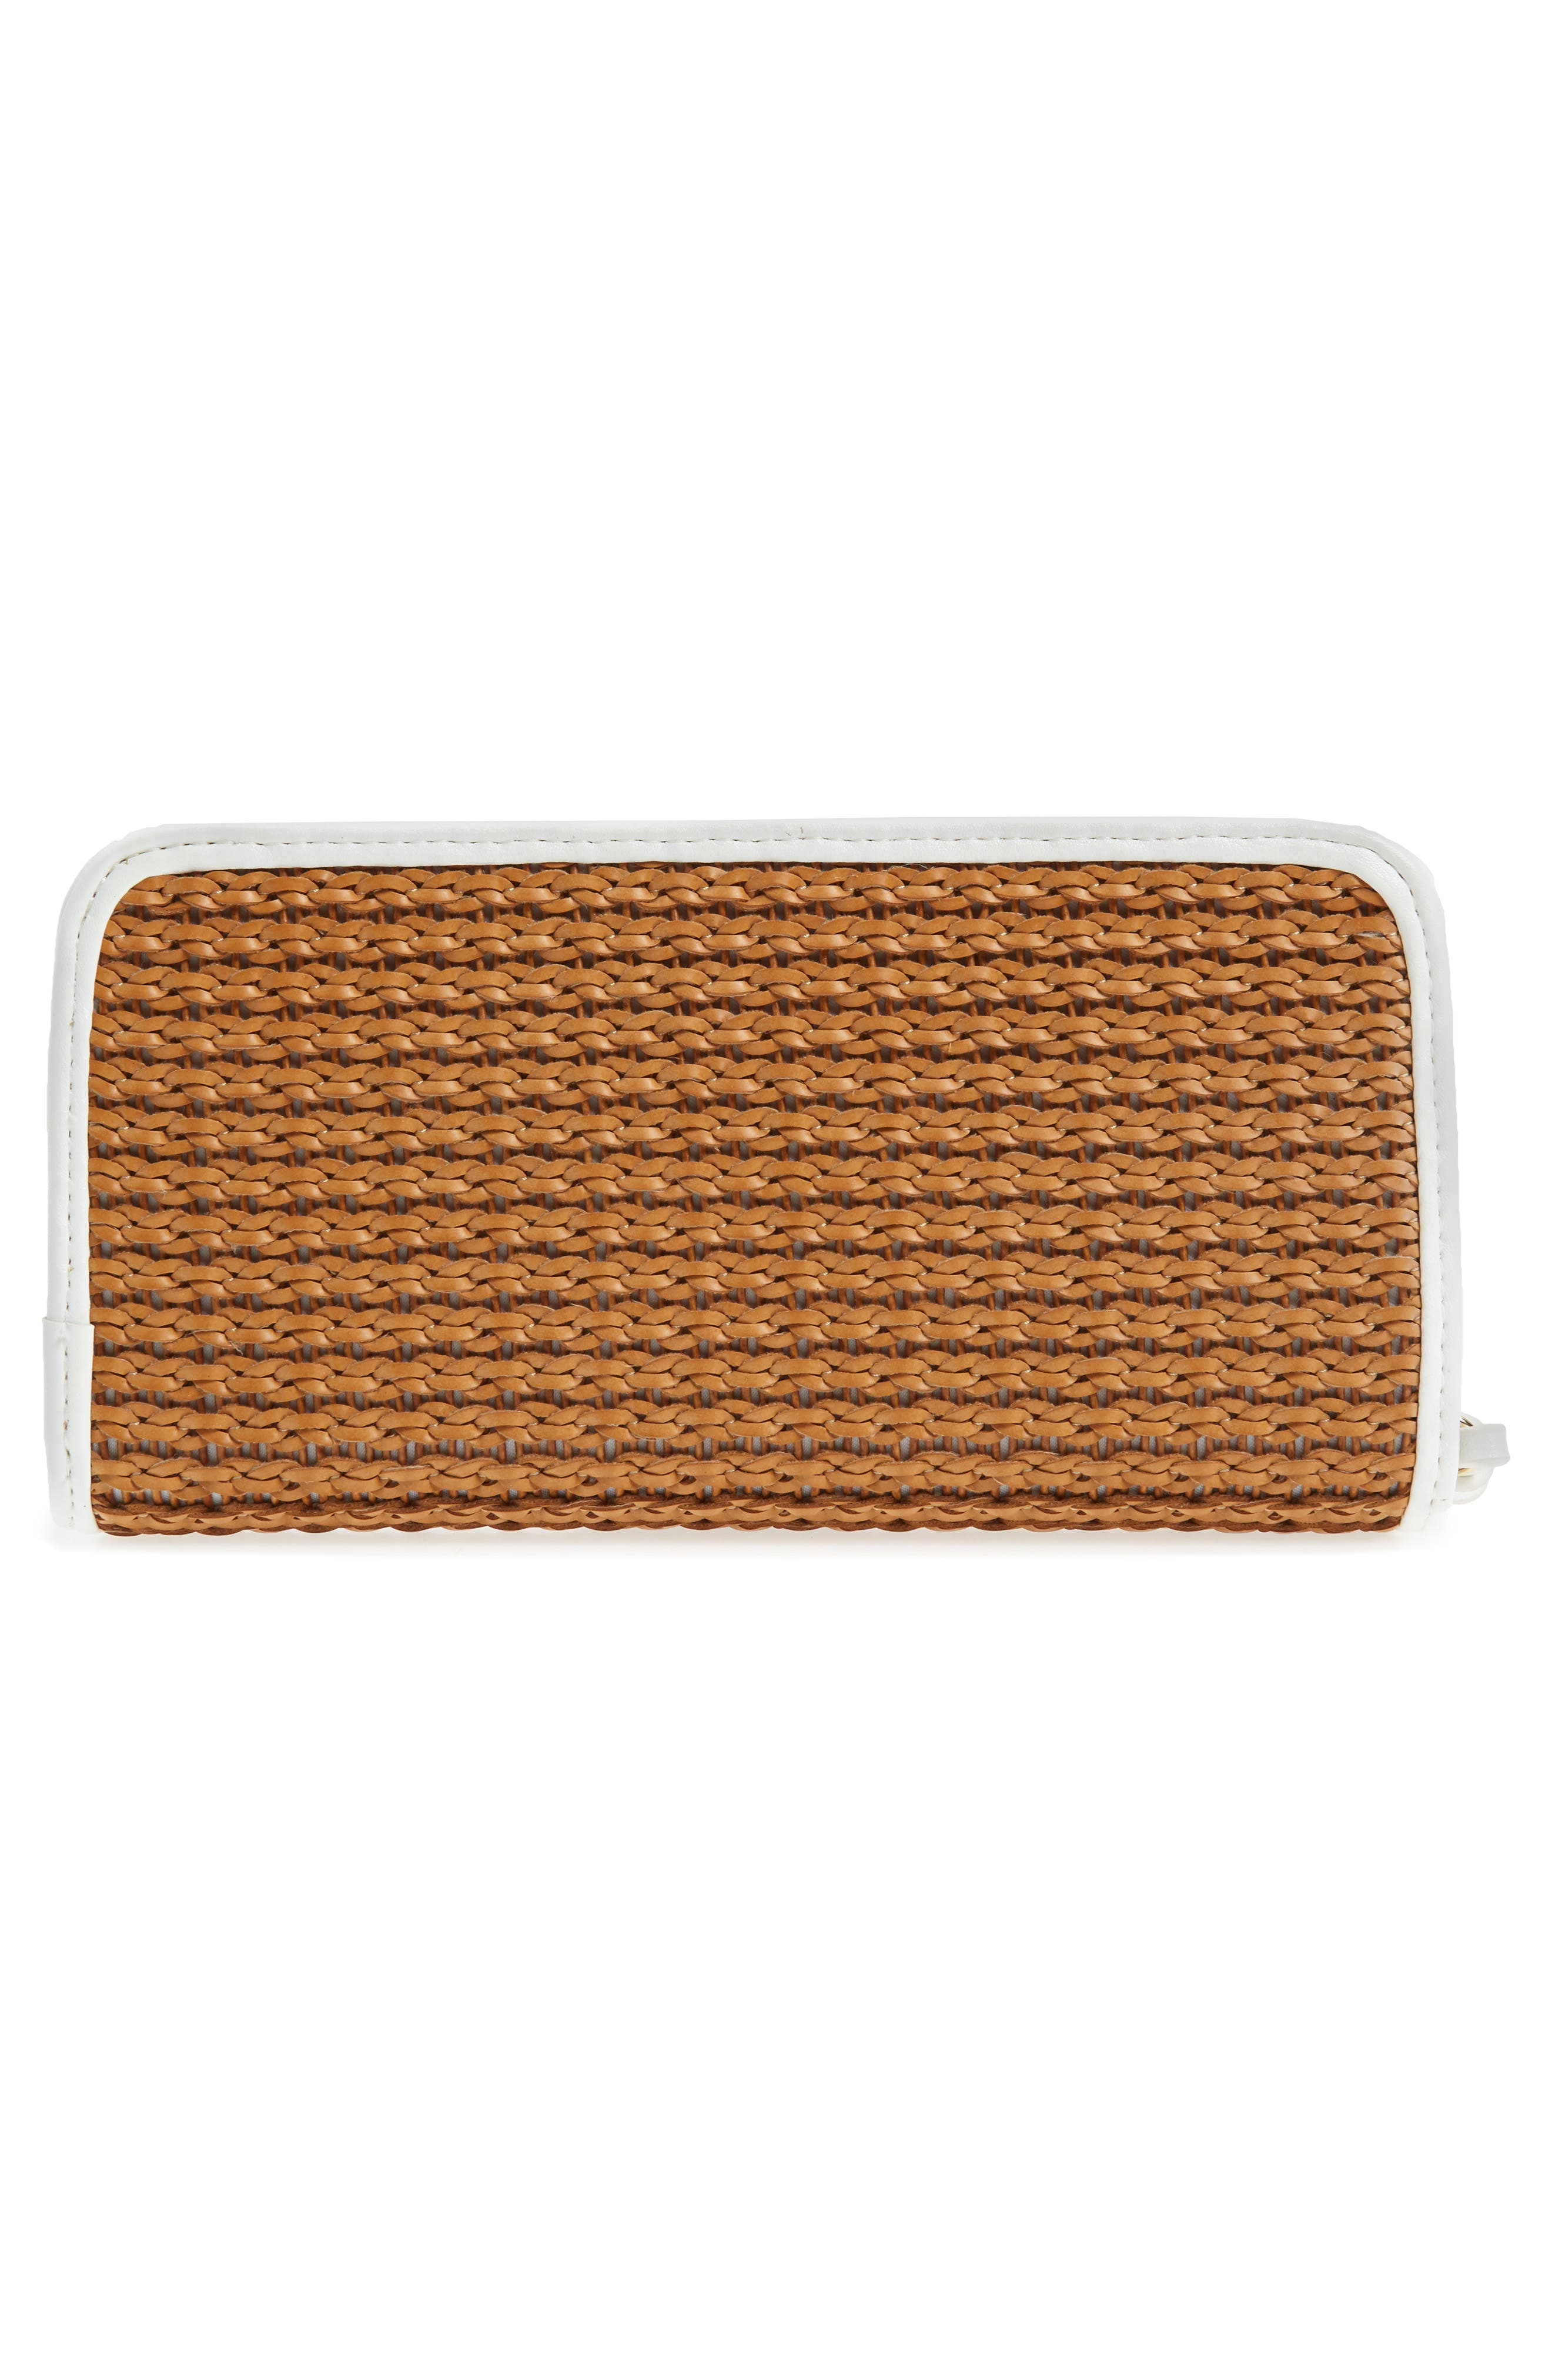 Mali + Lili Kyla Honor Basket Weave Wallet,                             Alternate thumbnail 3, color,                             Camel